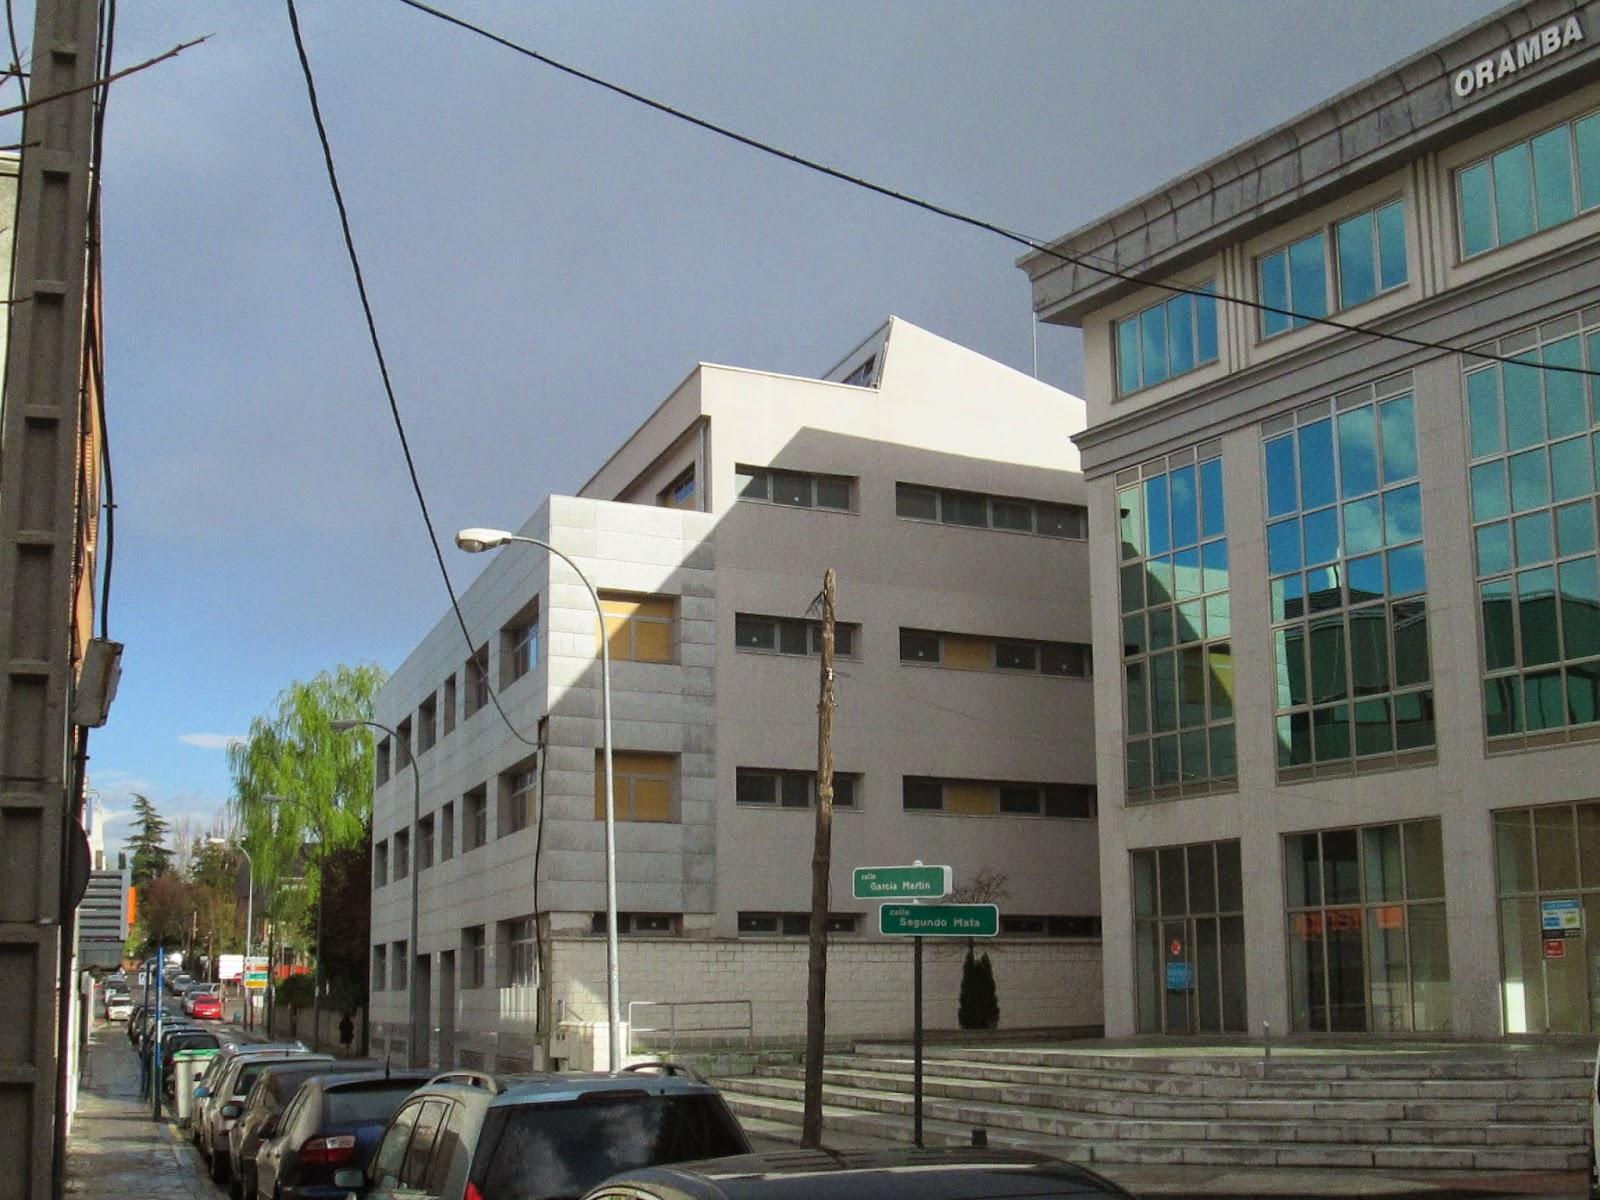 Proyecto meridiano edificio pozuelo - Edificio atica pozuelo ...